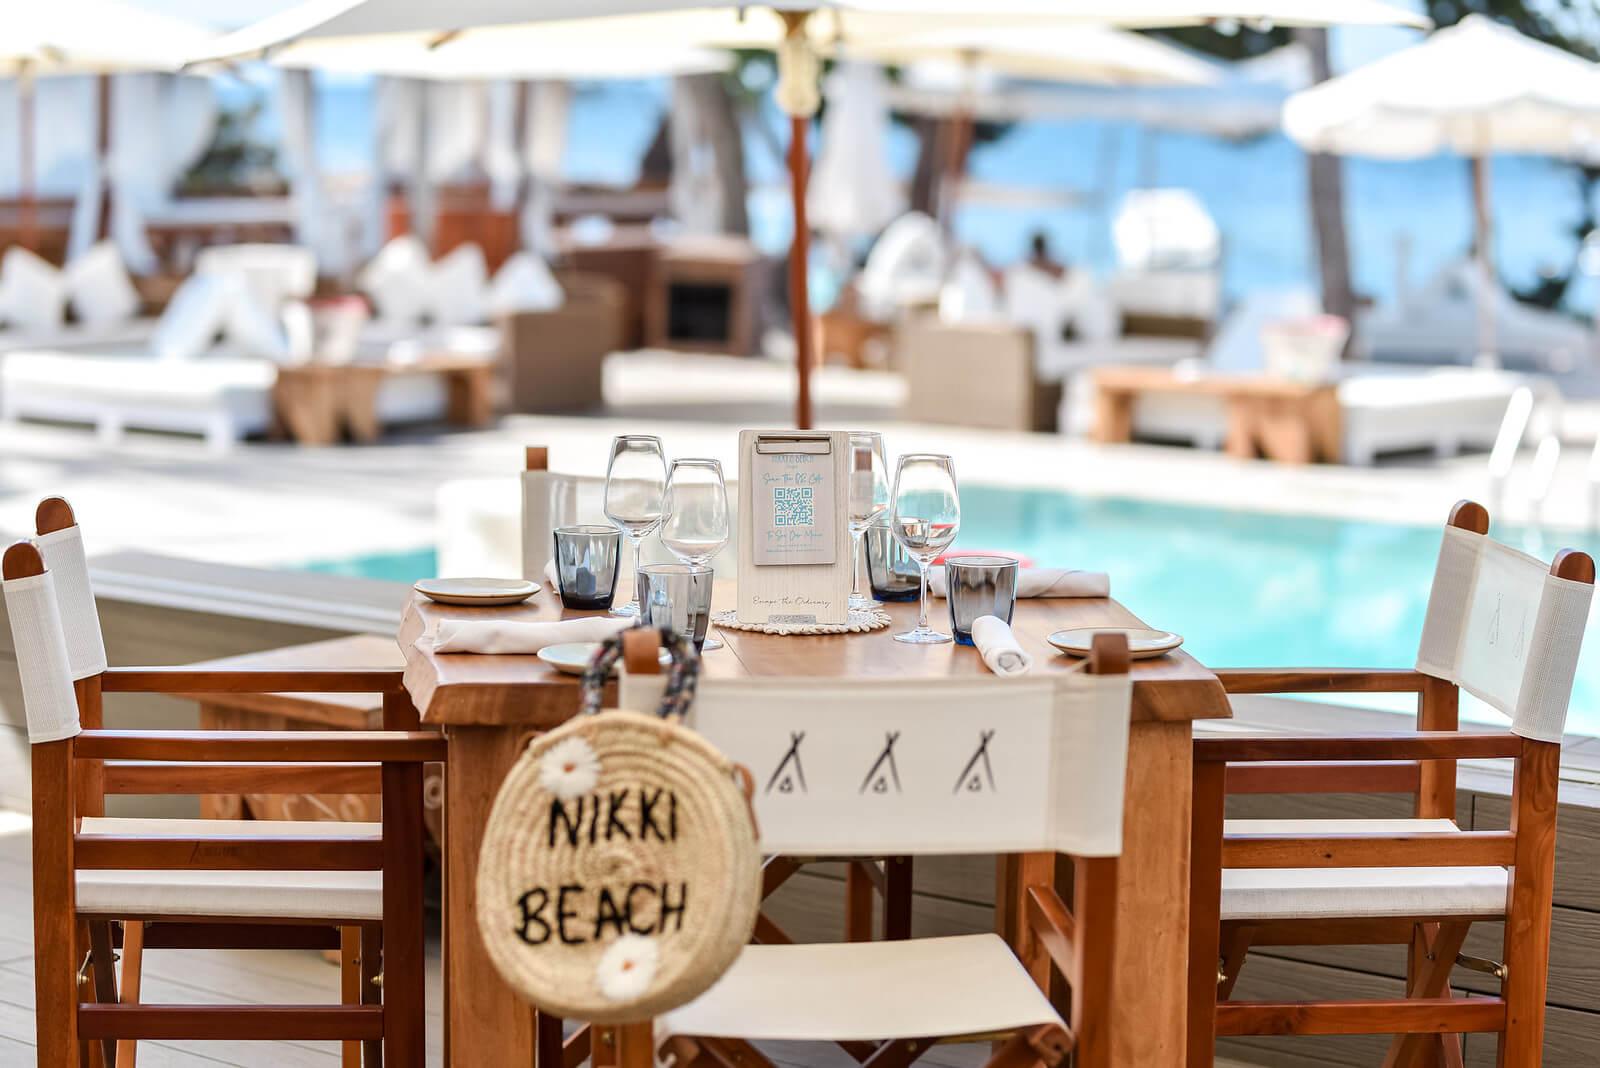 https://www.white-ibiza.com/wp-content/uploads/2020/03/white-ibiza-restaurants-nikki-beach-ibiza-2020-12.jpg